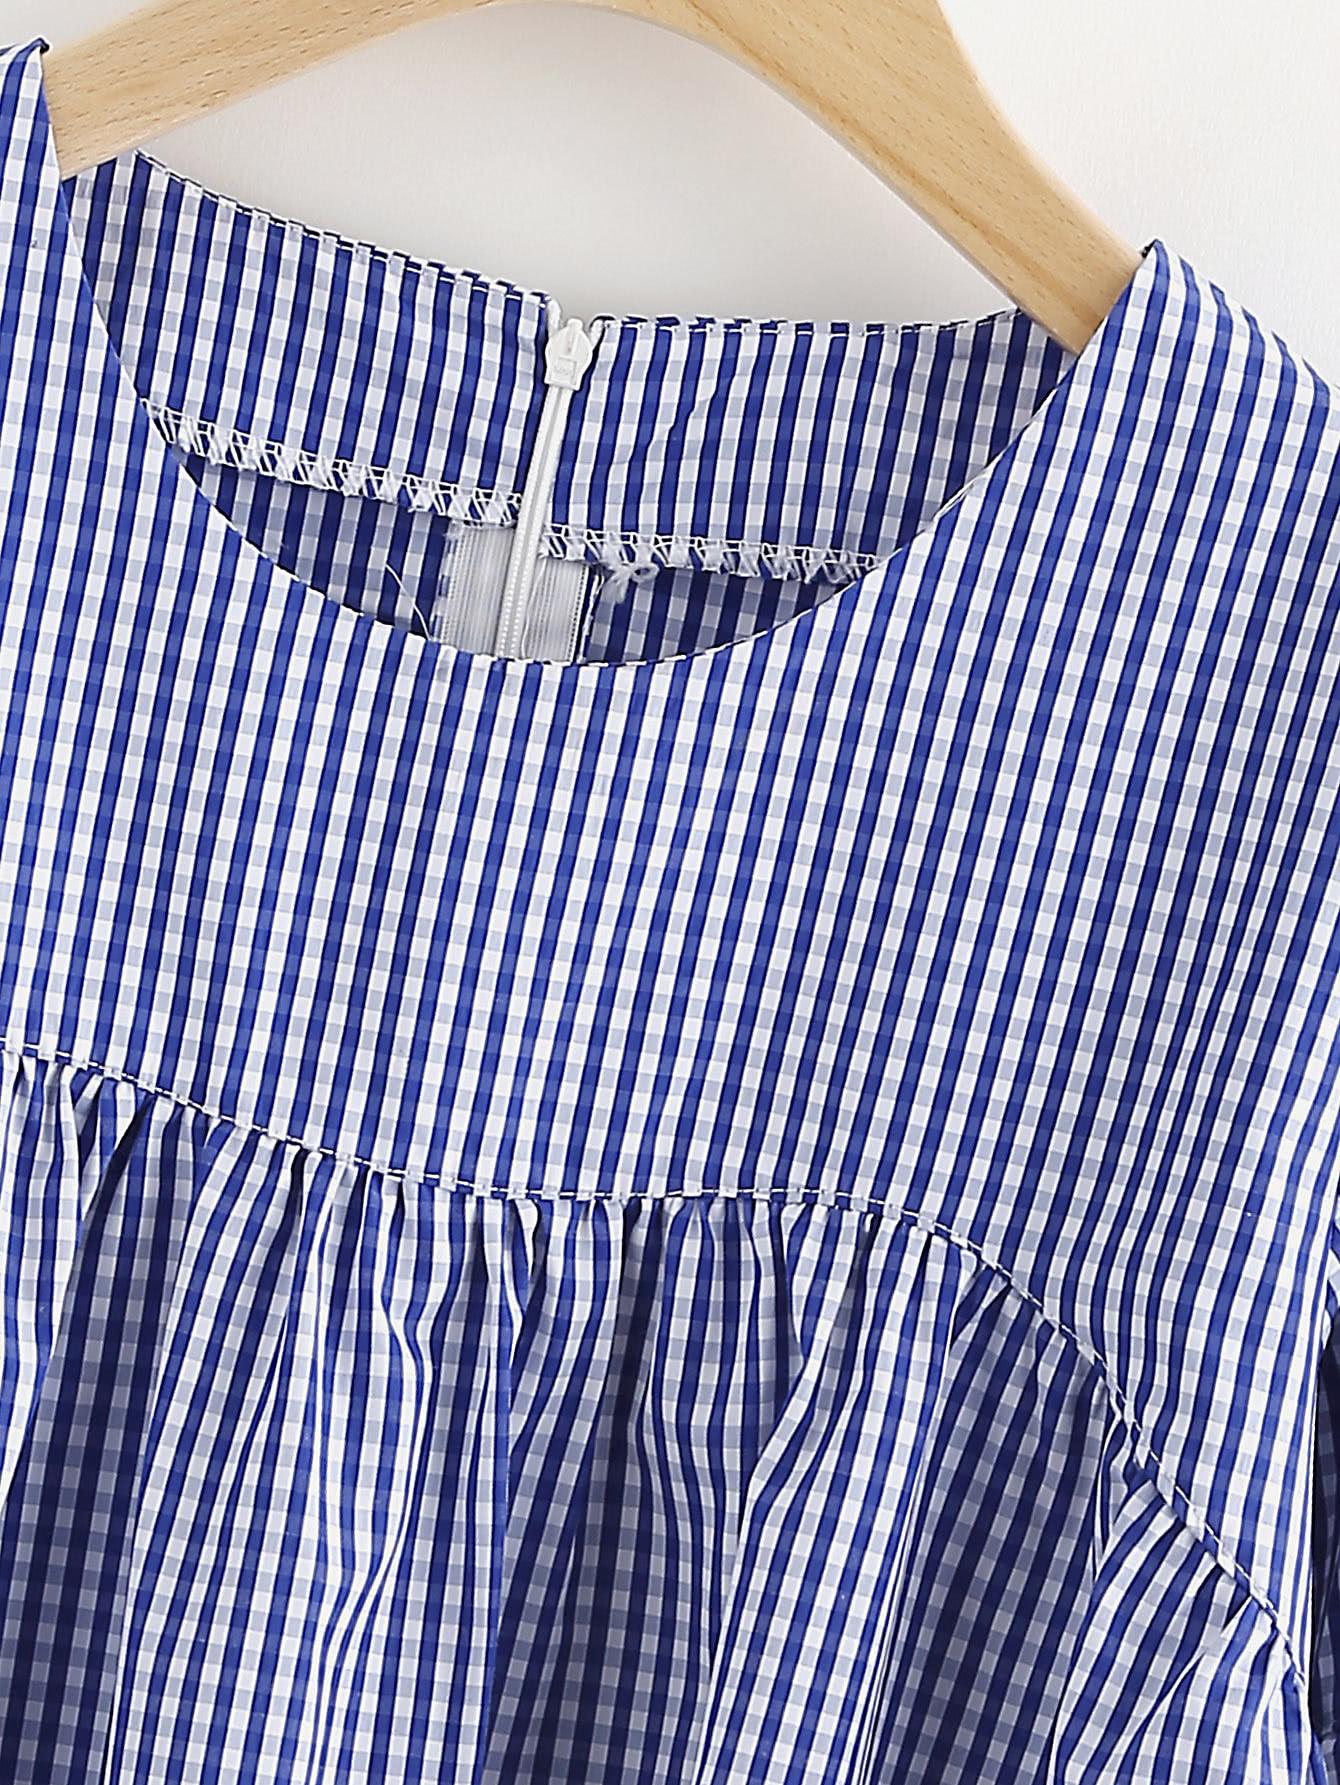 blouse170418102_2